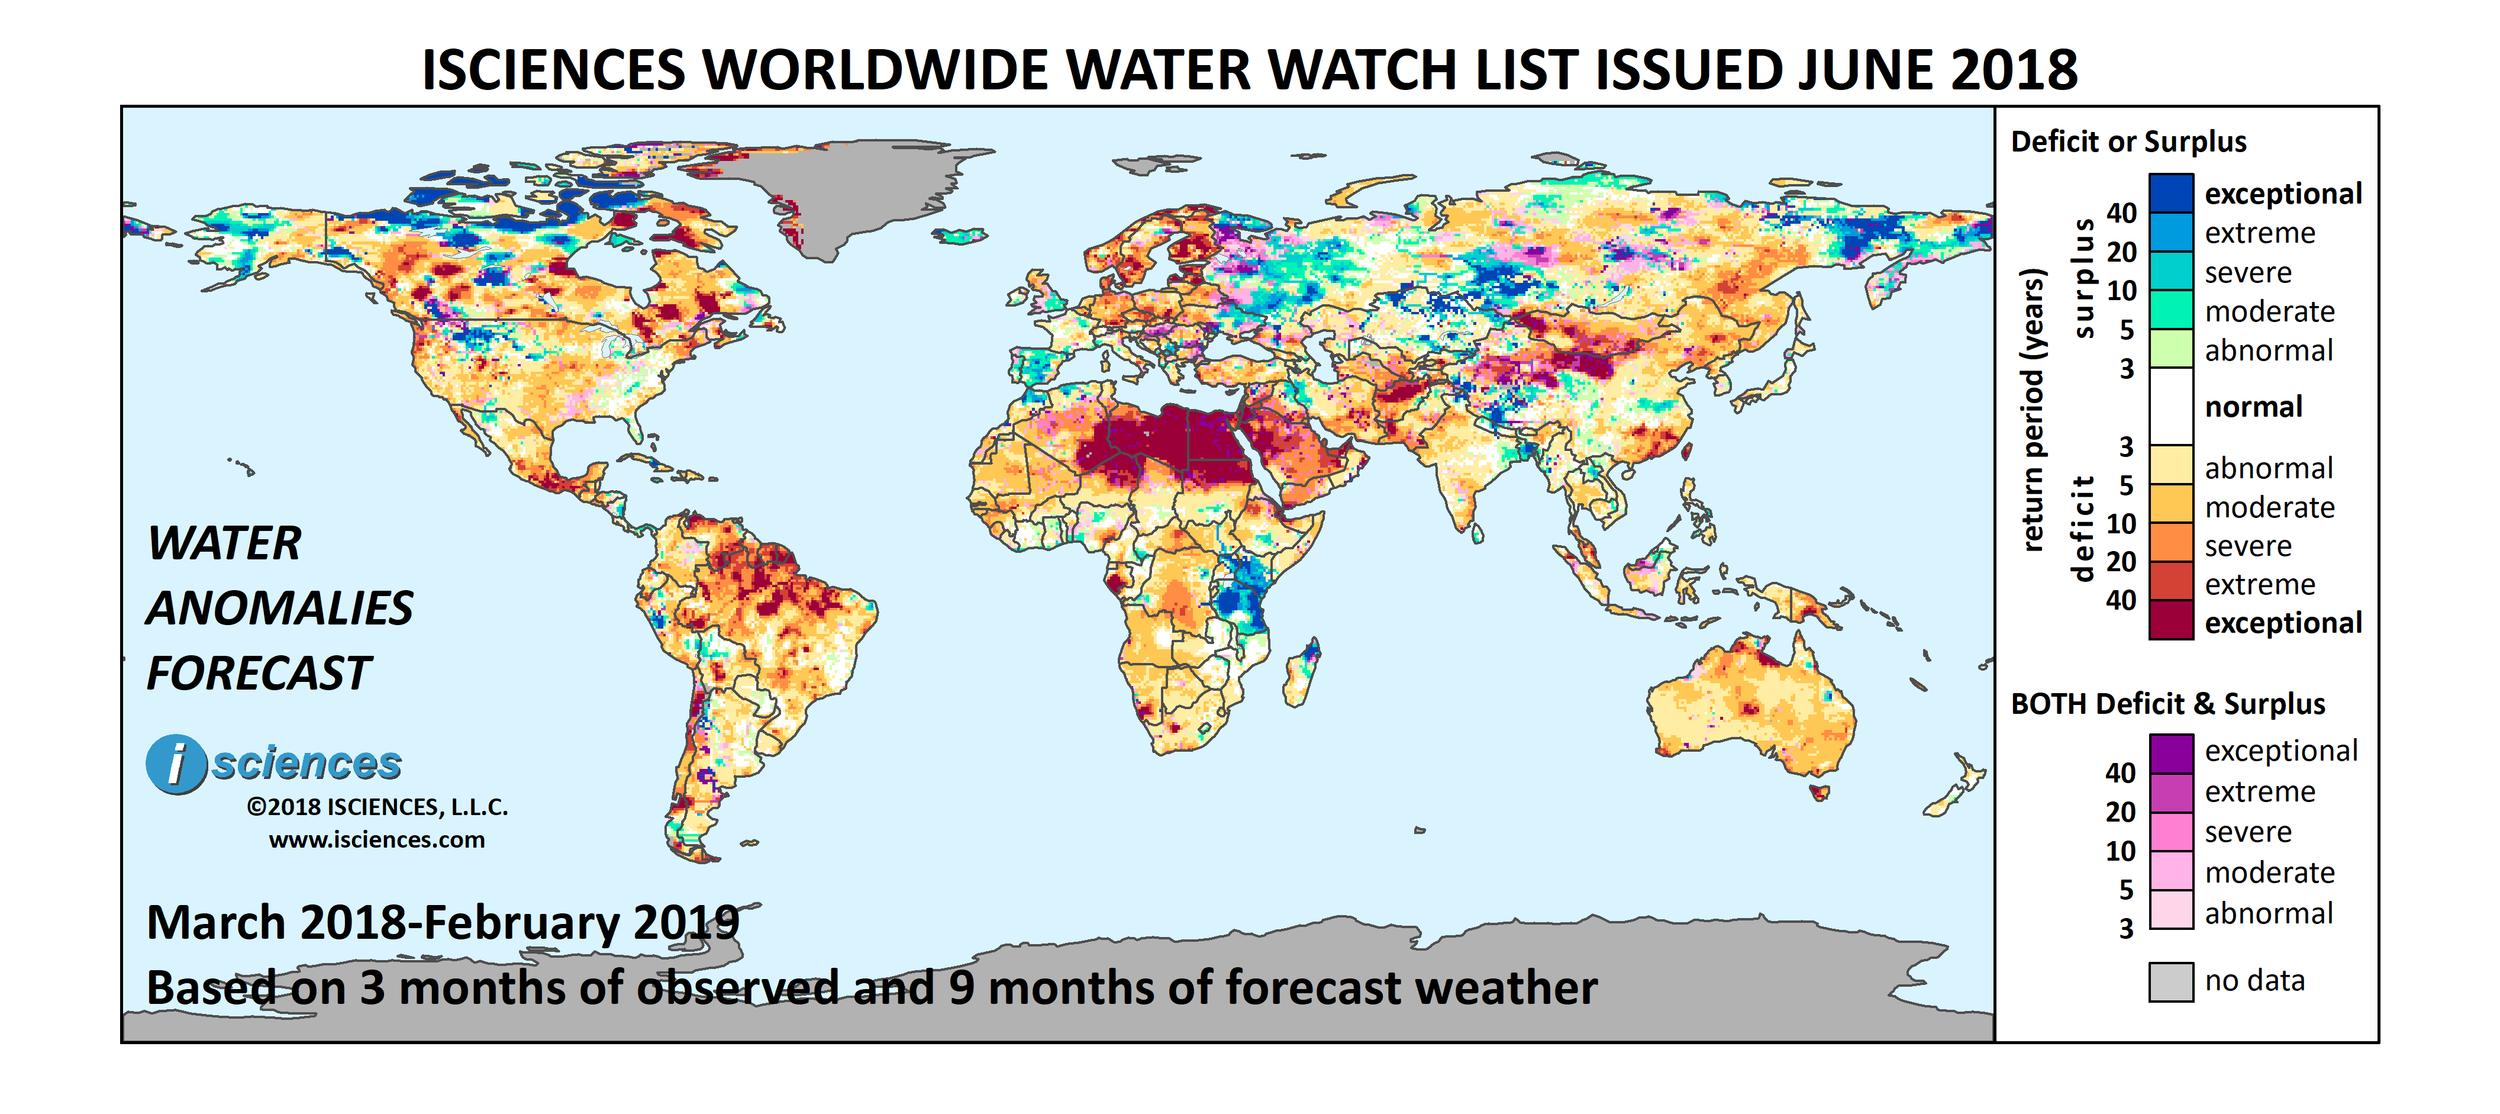 ISciences_Worldwide_Water_Watch_List_2018_June.png